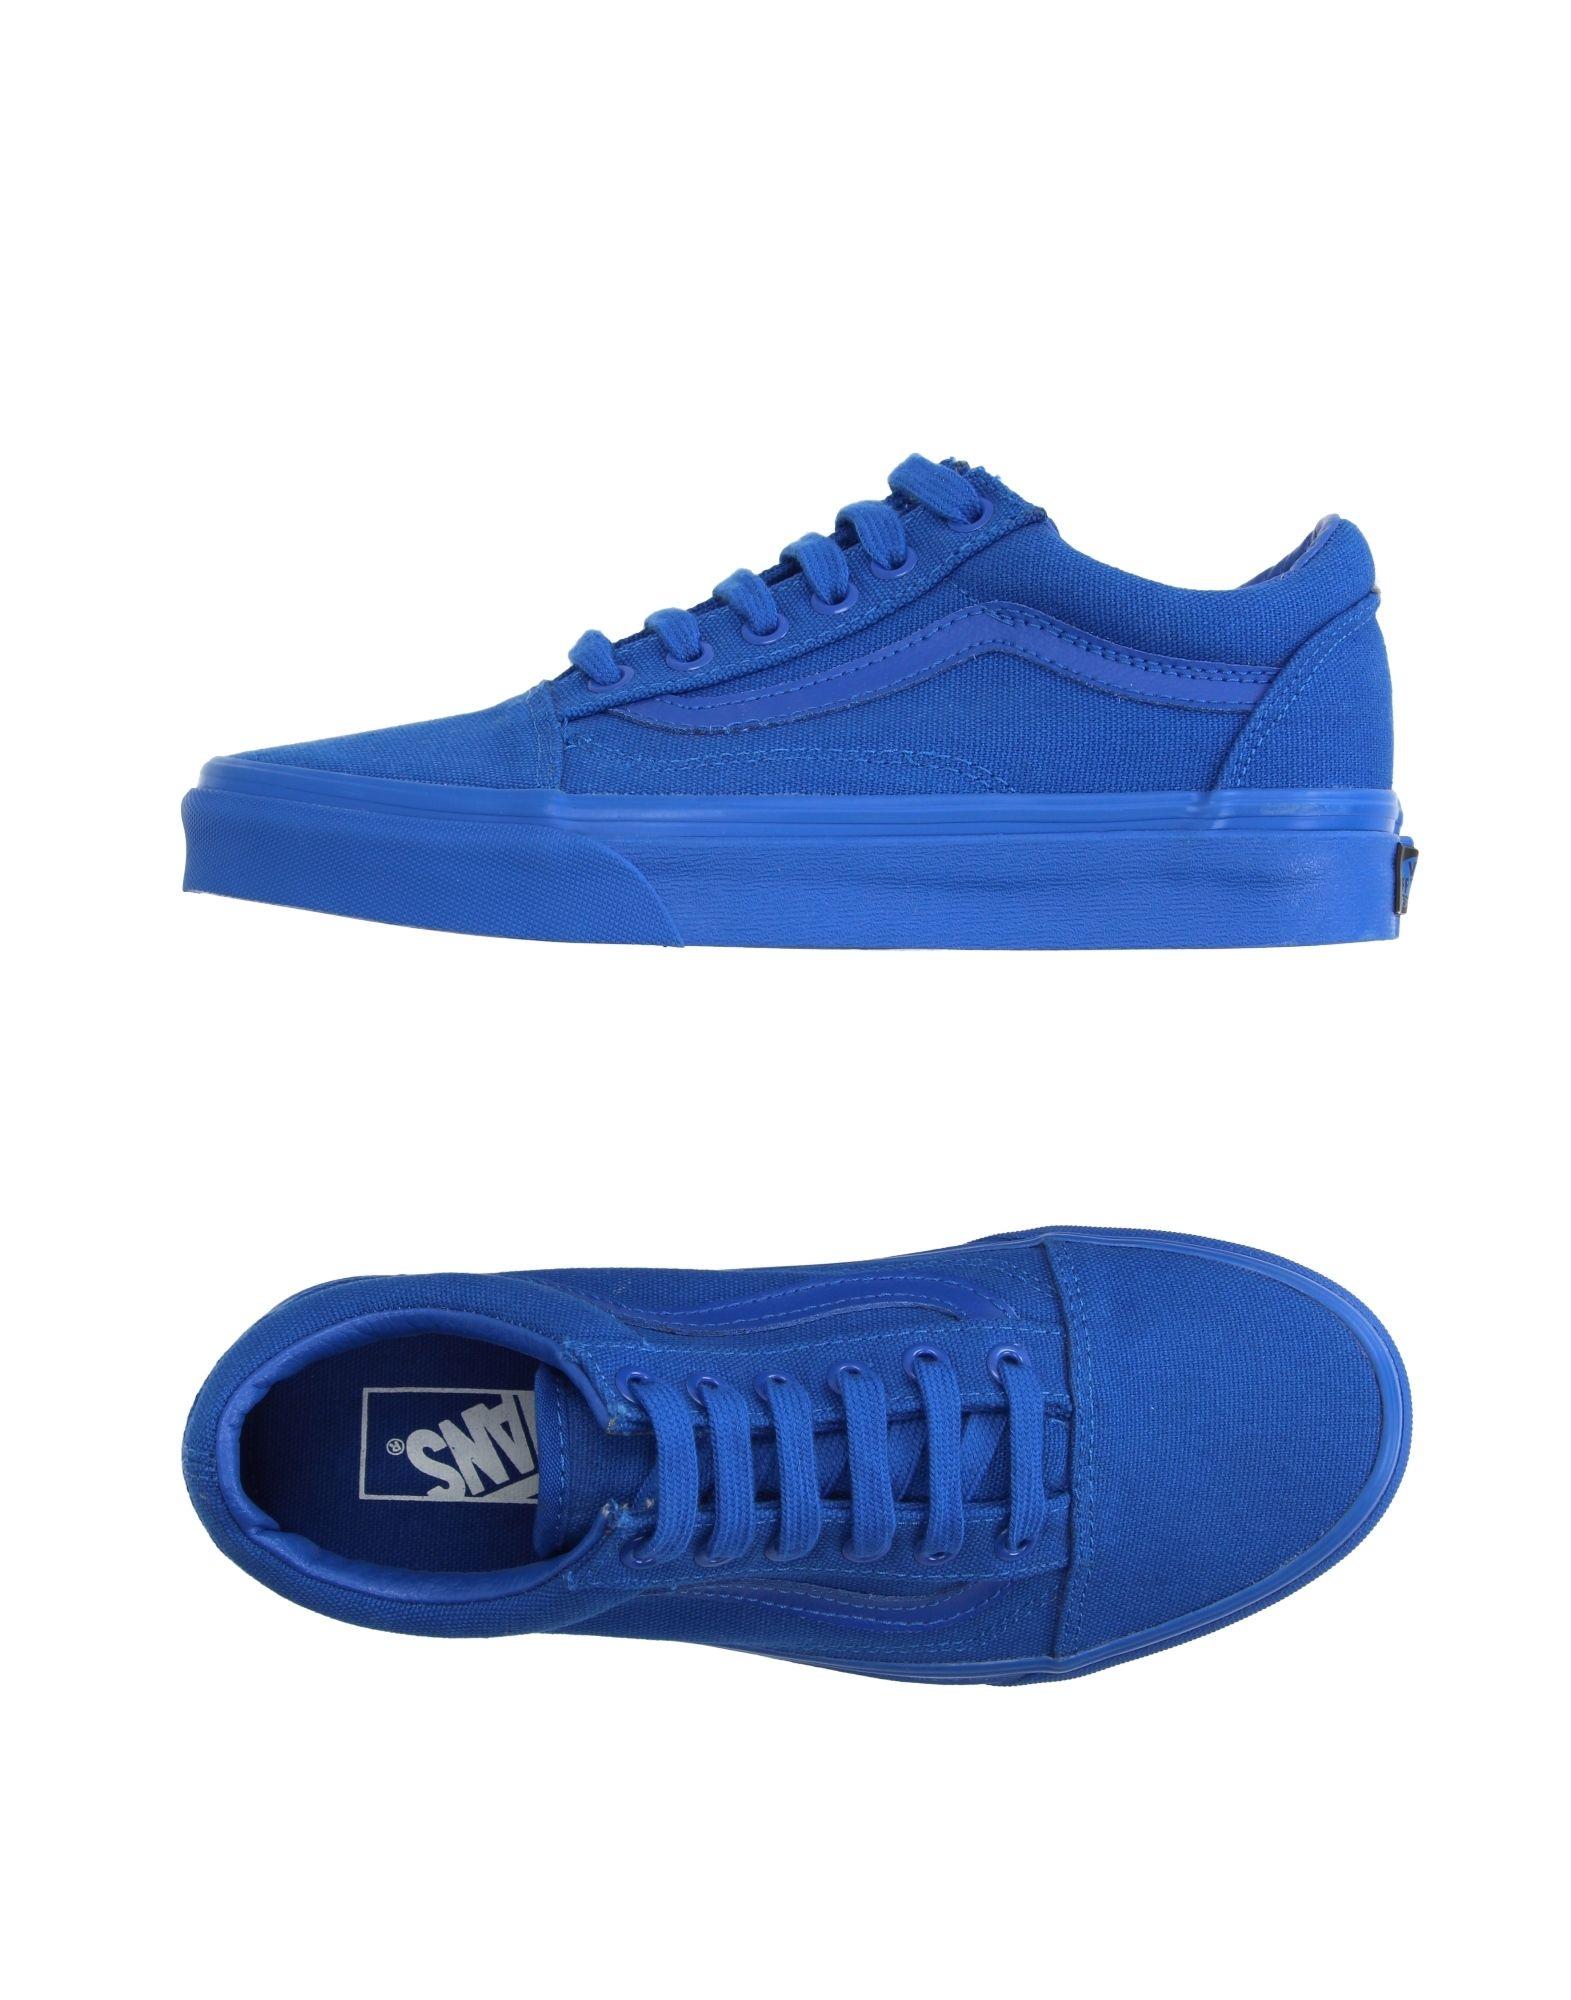 Vans Sneakers Damen  11142895DW Gute Qualität beliebte Schuhe